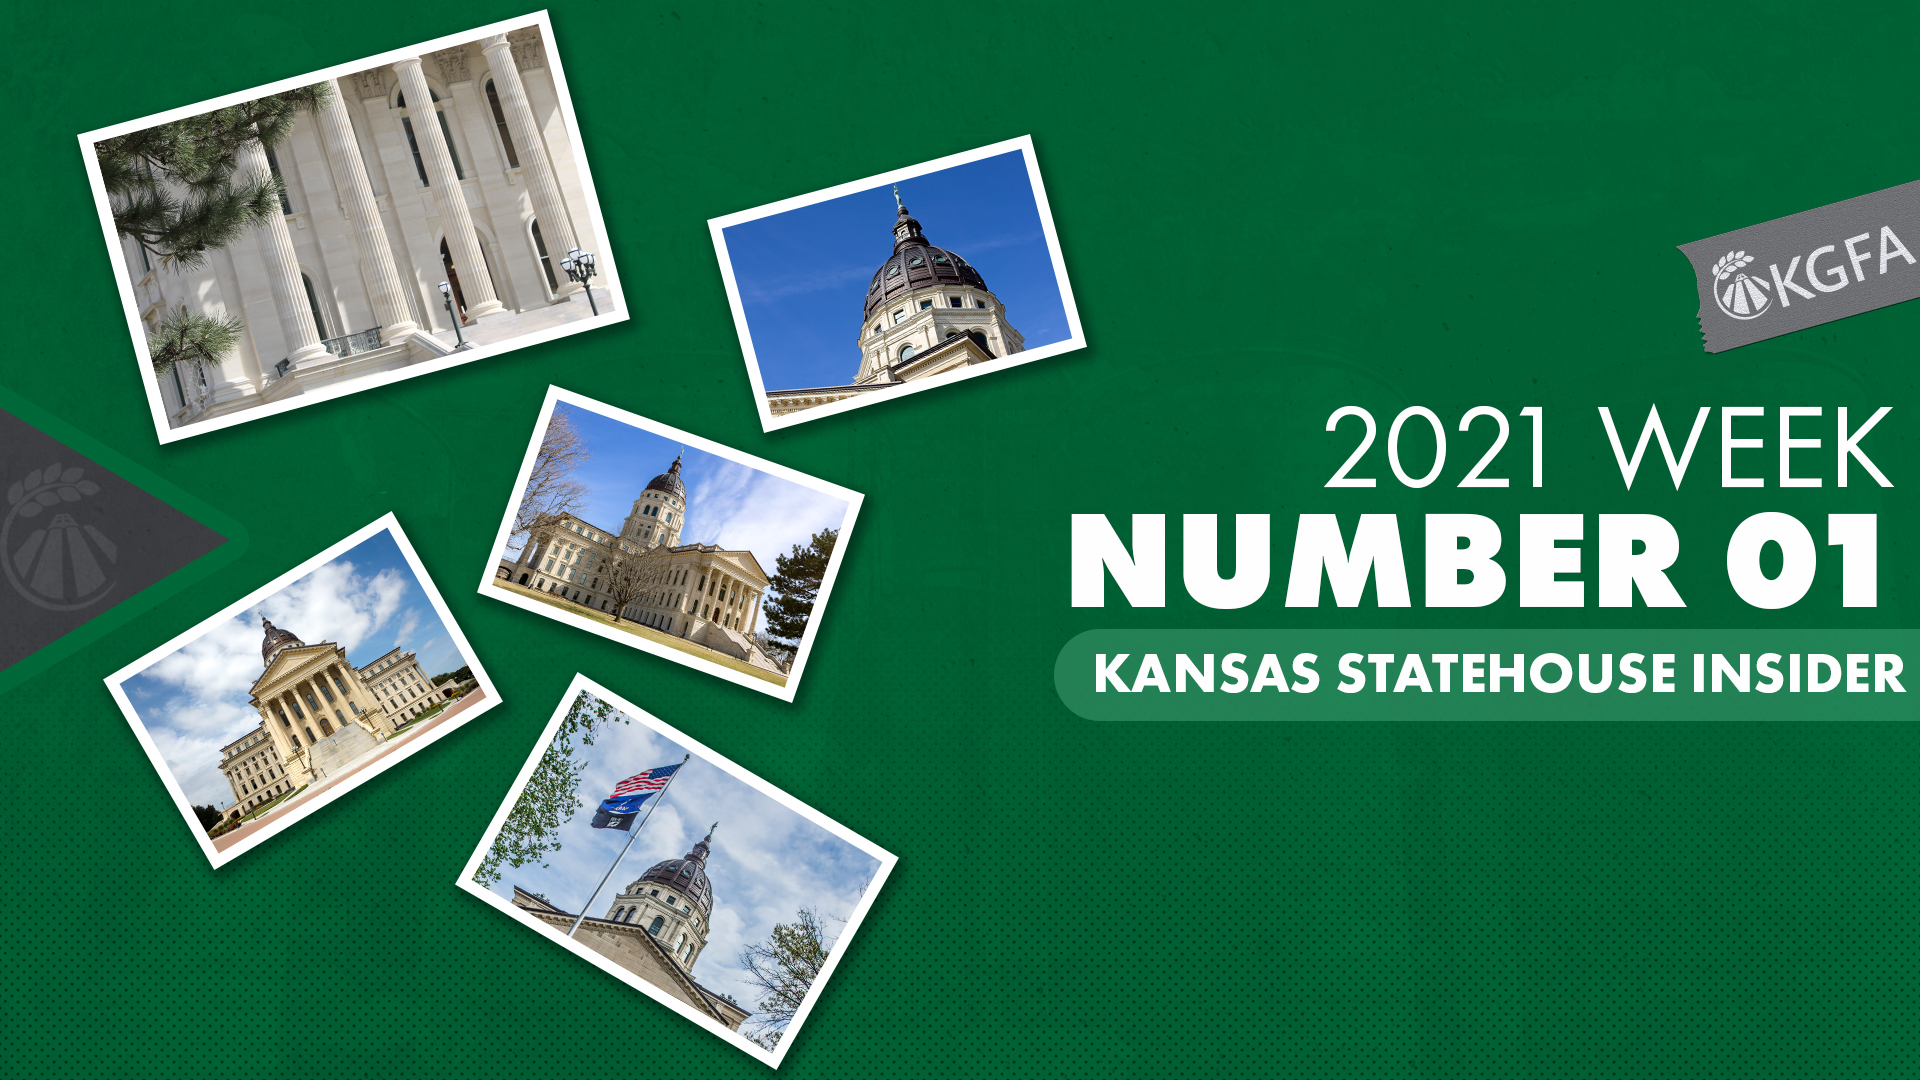 Kansas Statehouse Insider